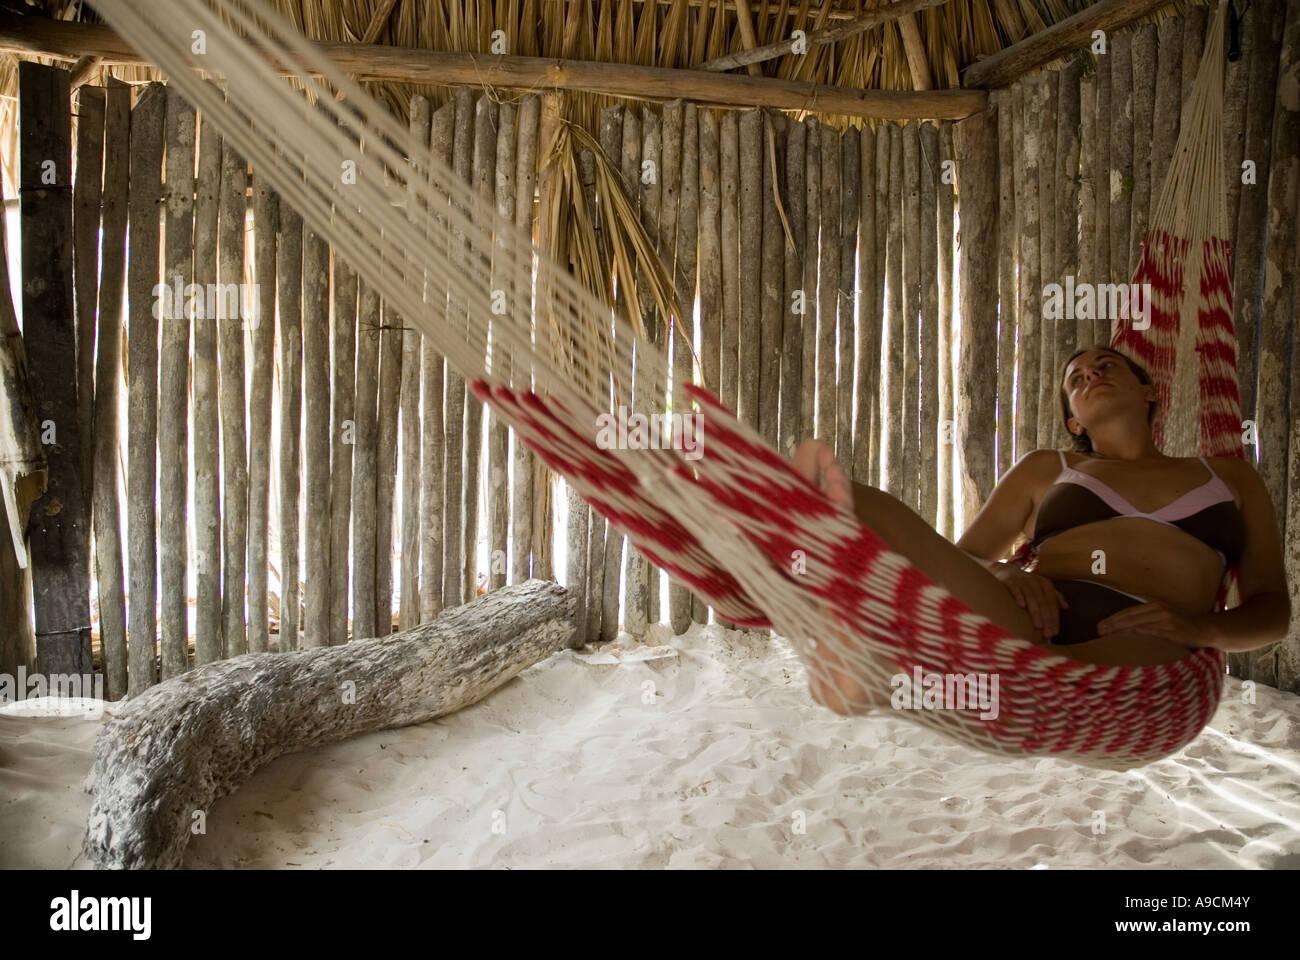 tulum caribbean woman inside a cabana hut lying in a hammock tulum caribbean woman inside a cabana hut lying in a hammock stock      rh   alamy